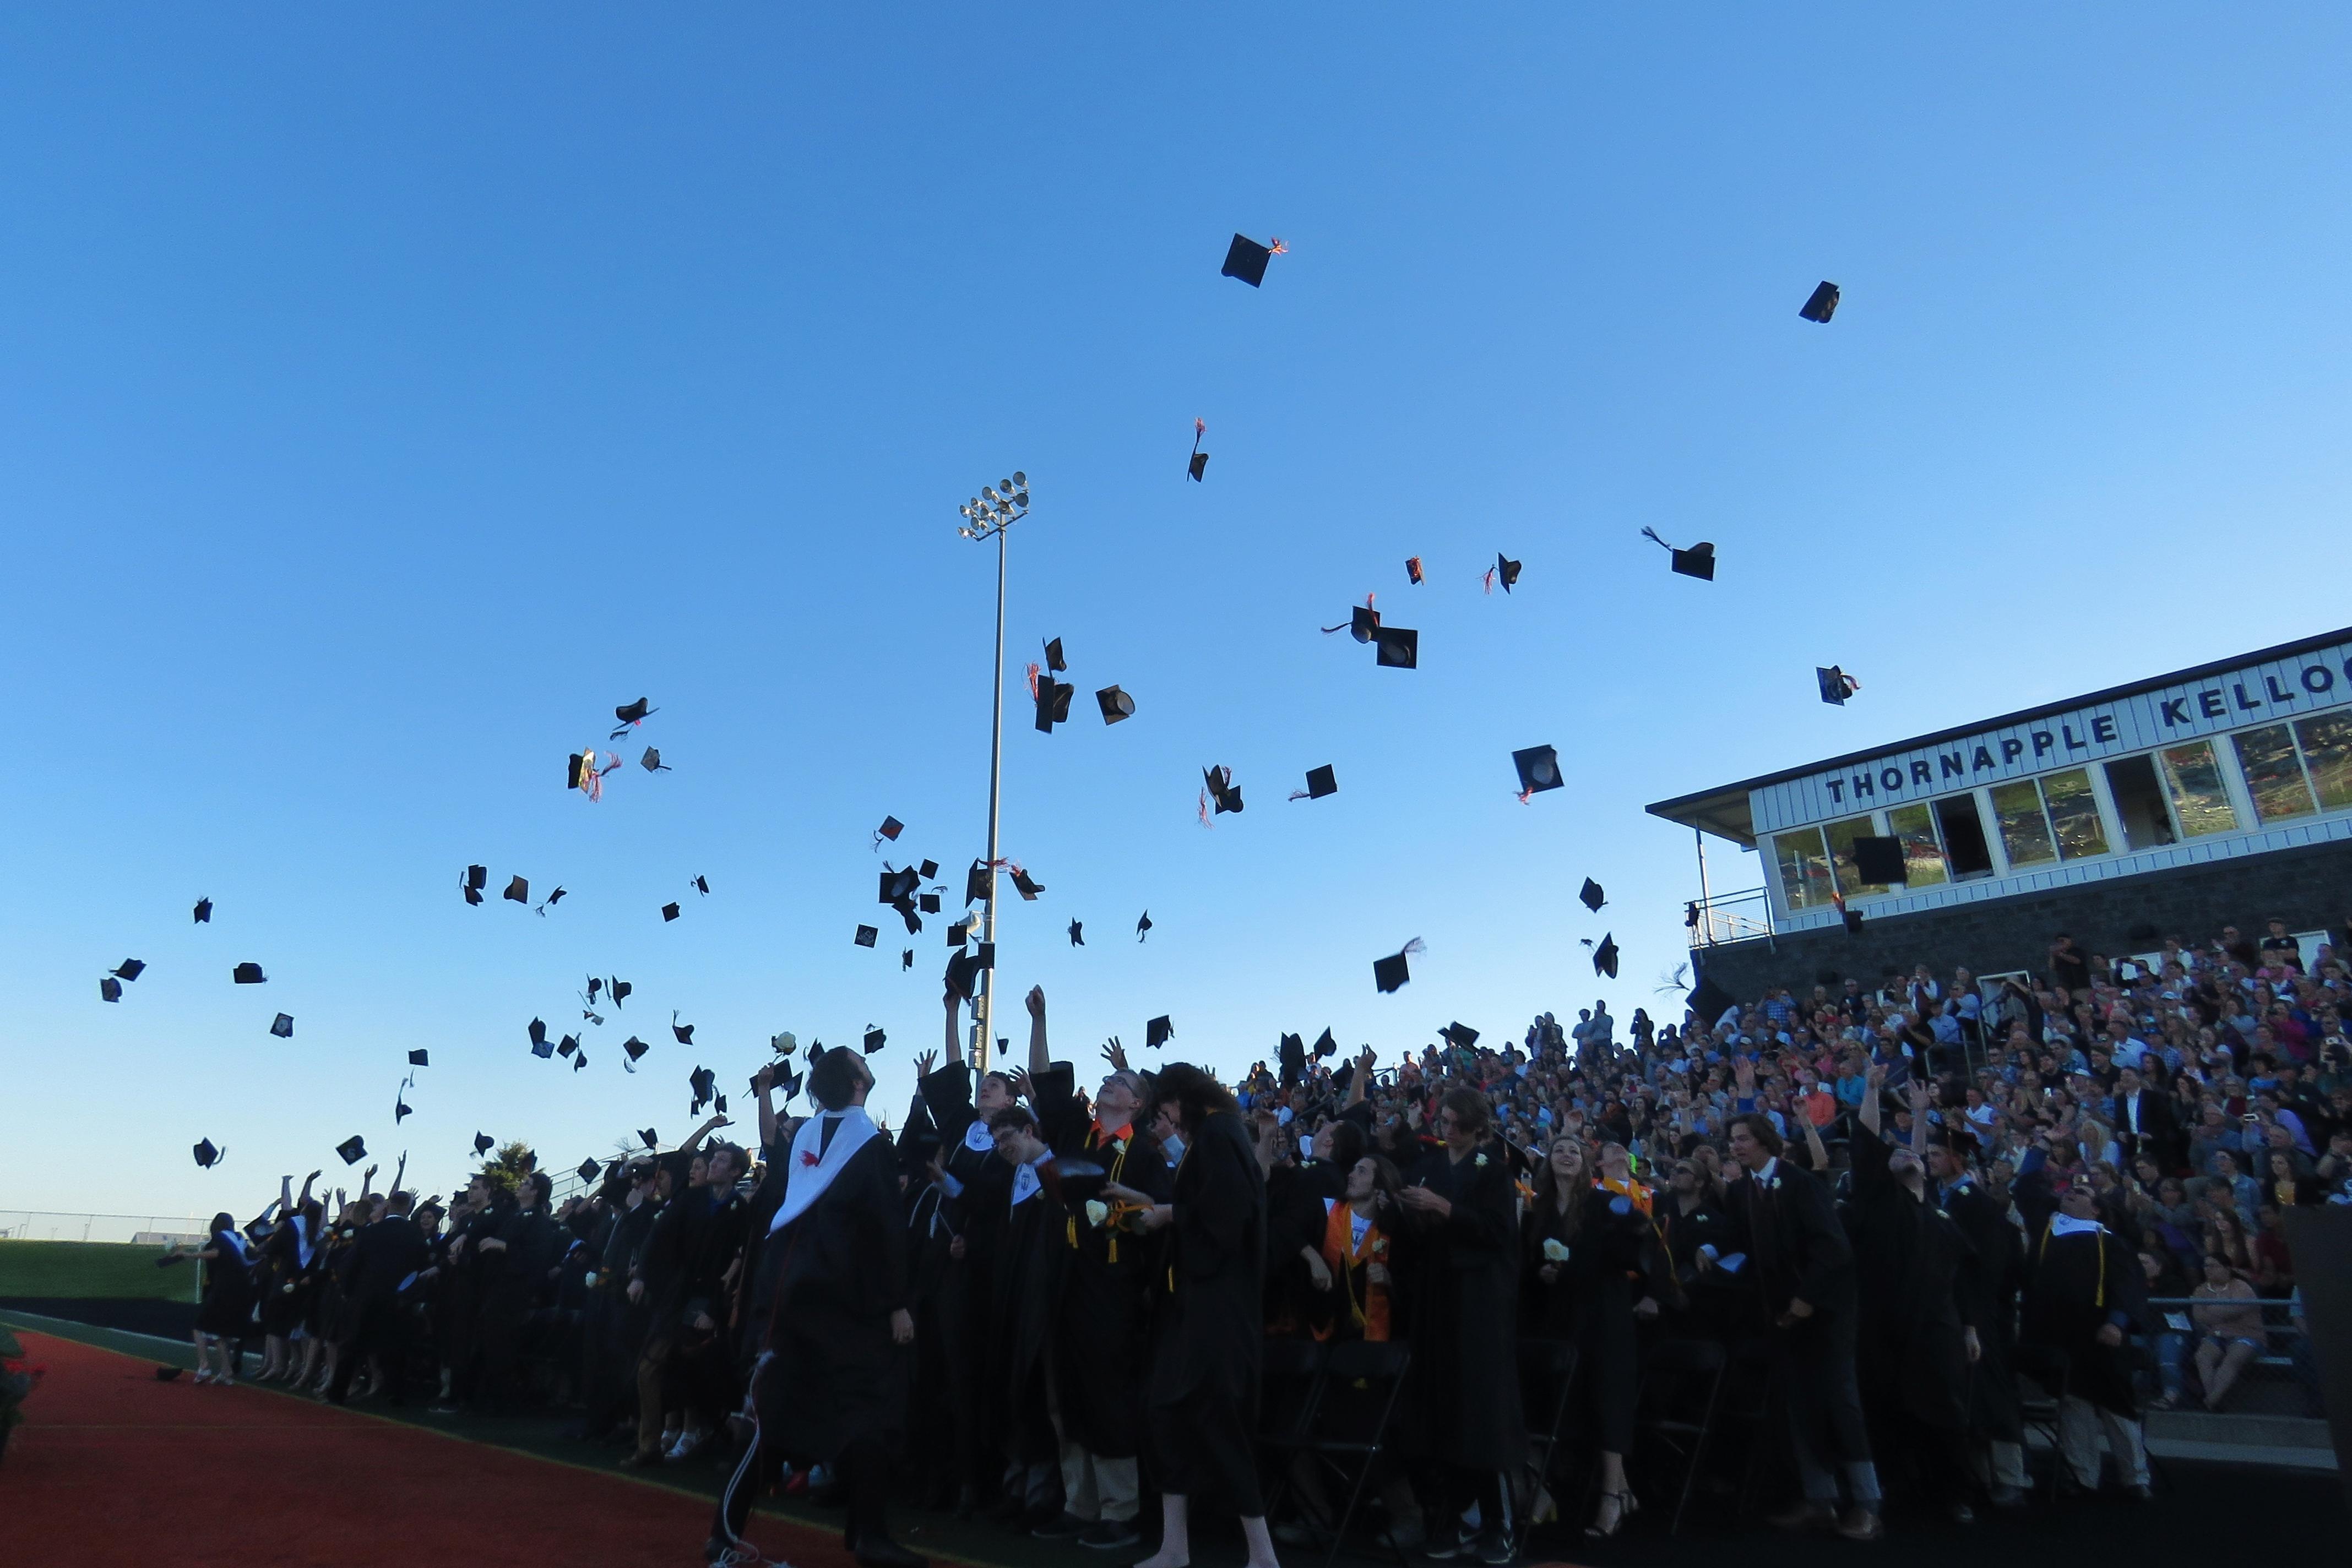 Thornapple Kellogg High School students celebrate at graduation.